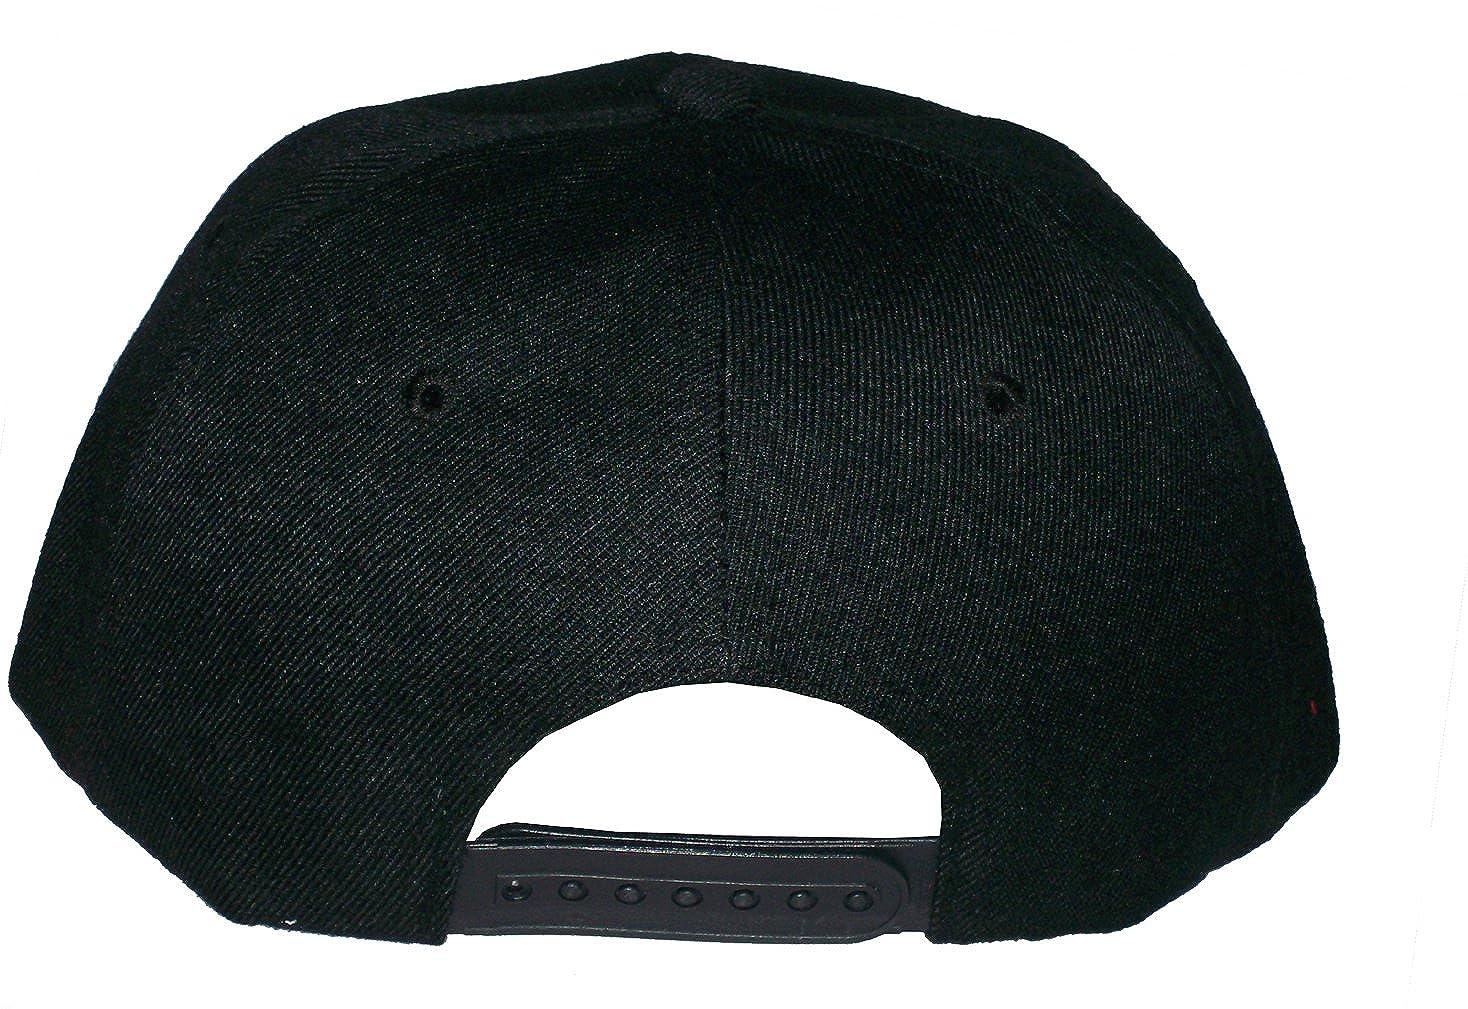 c6c63b0d5df55 Amazon.com  Rob sTees Taylor Gang All Star Black Wiz Khalifa Snapback Hat  Cap  Clothing